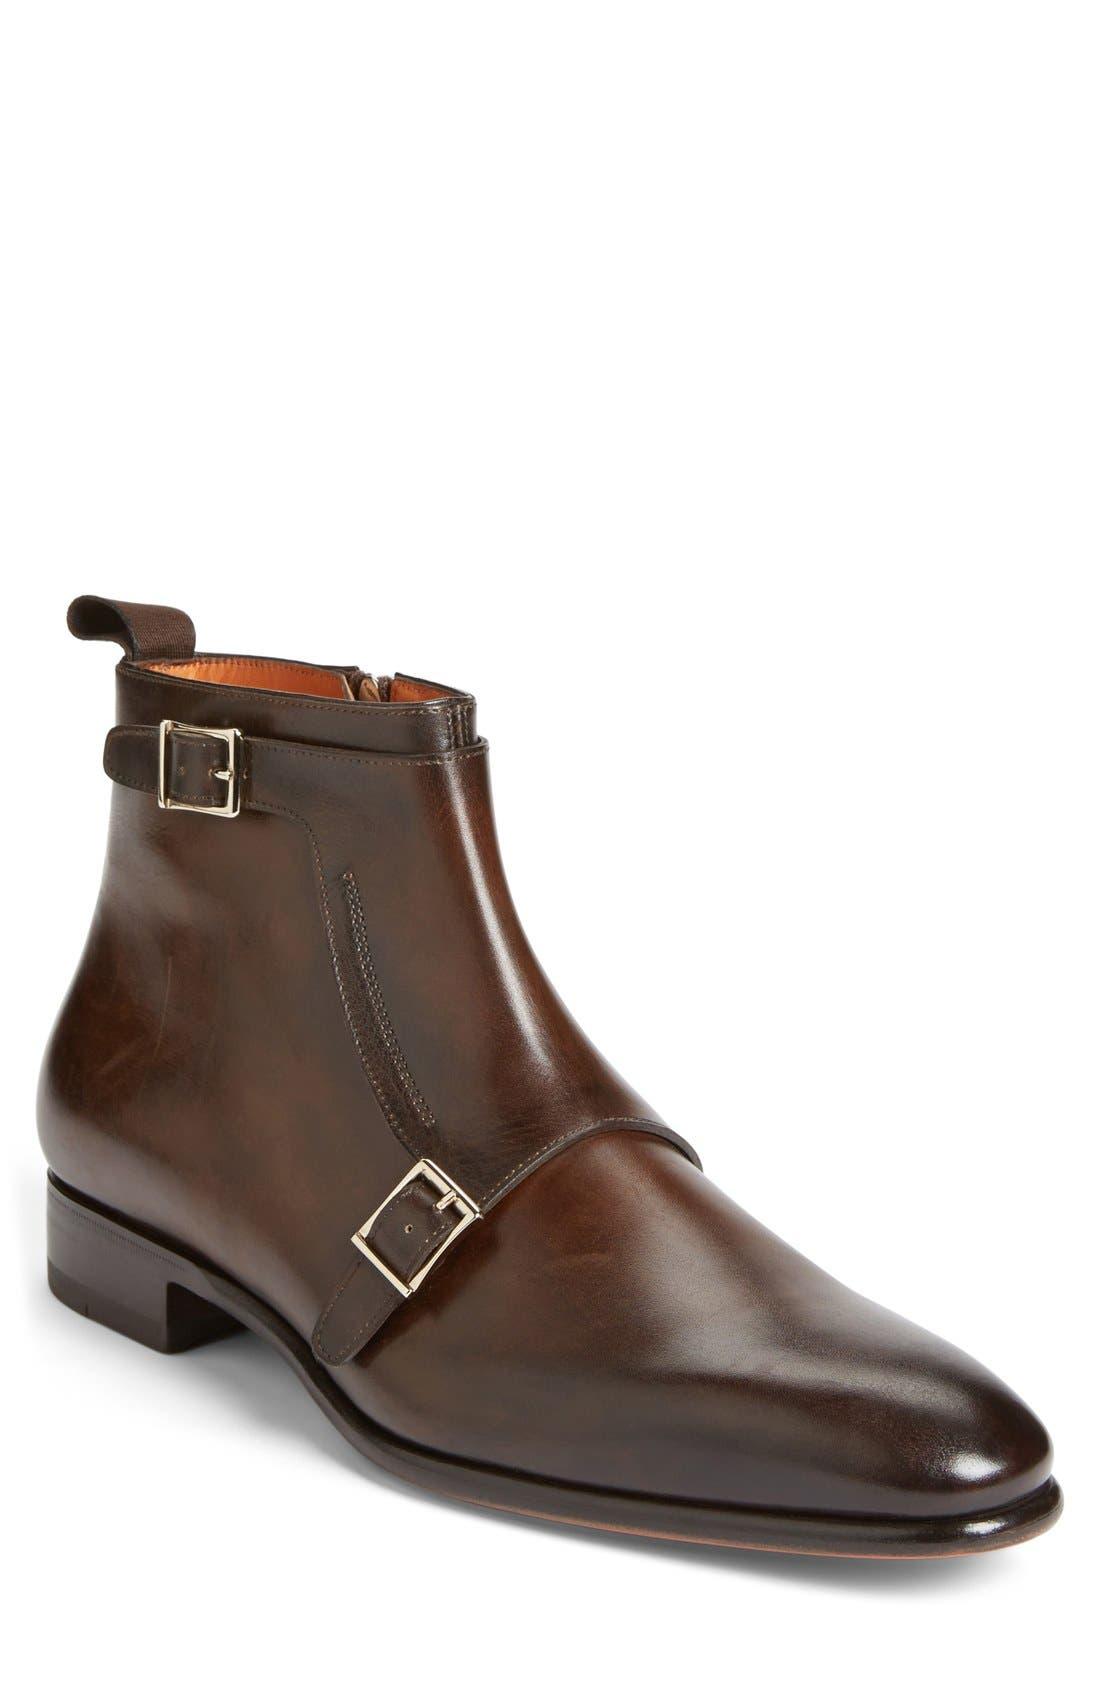 'Ciro' Double Monk Strap Boot,                         Main,                         color,